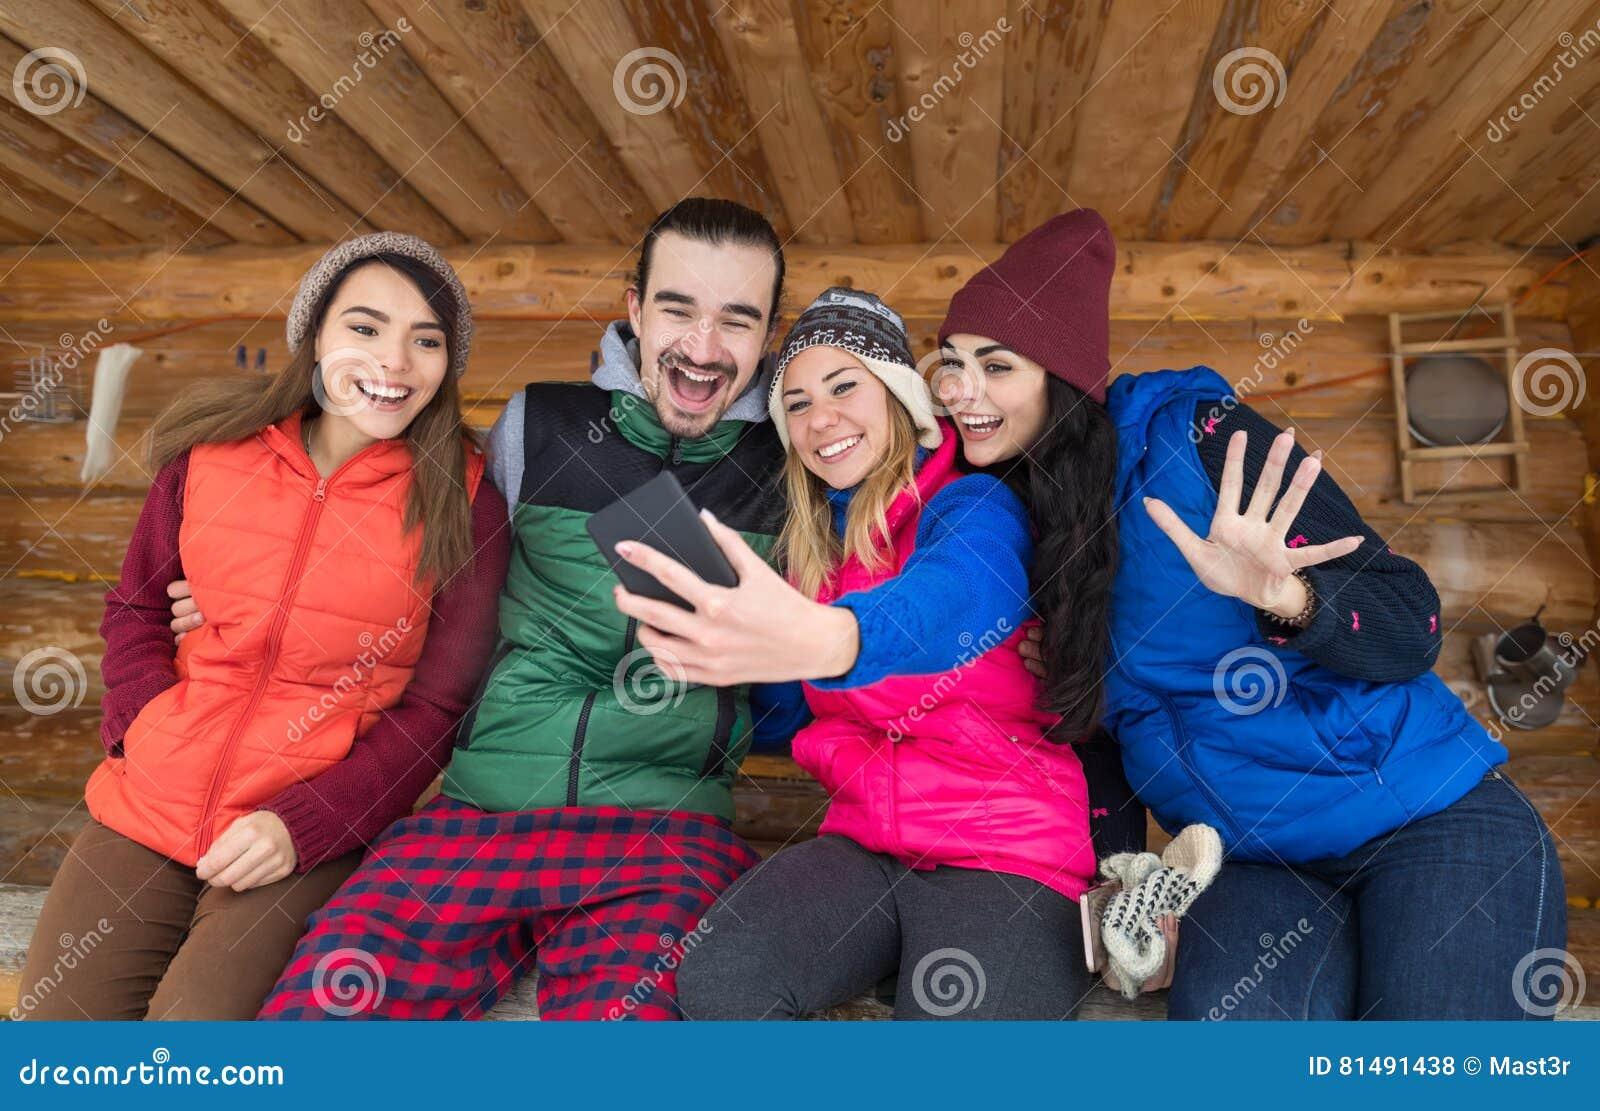 La Gente Agrupa Tomar A Foto De Selfie El Teléfono Elegante